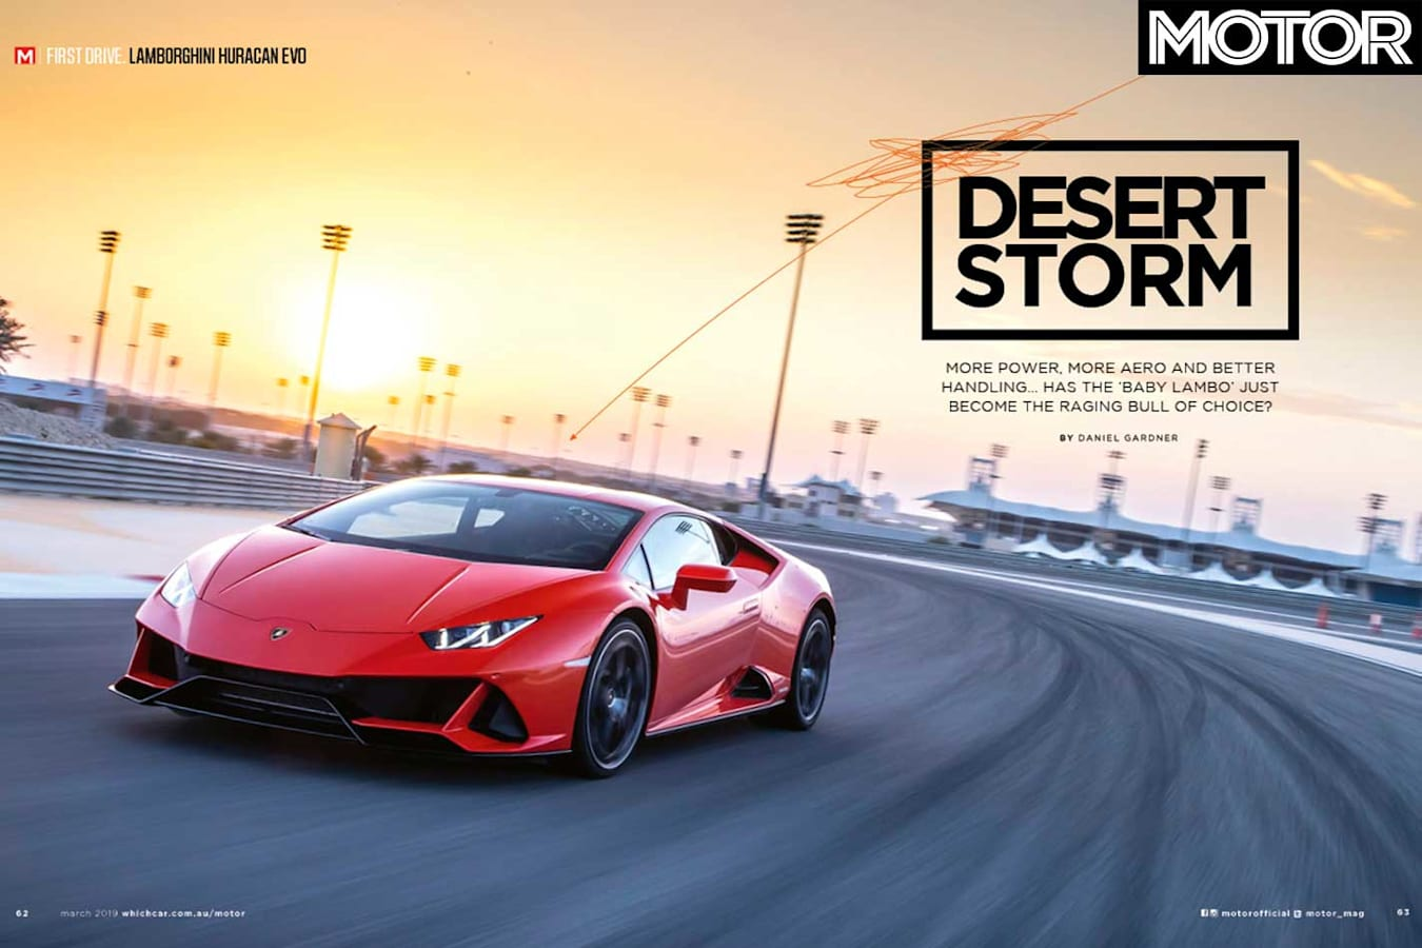 MOTOR Magazine March 2019 Issue Lamborghini Huracan Evo Jpg